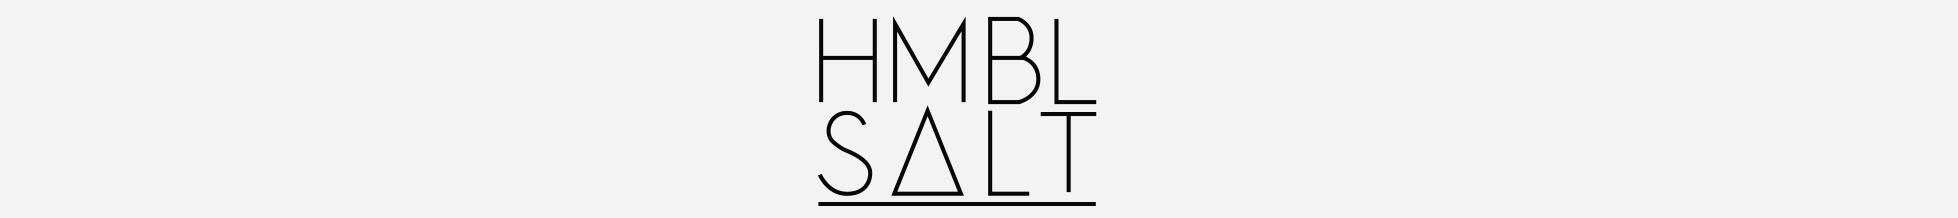 hmbl-salt.jpg